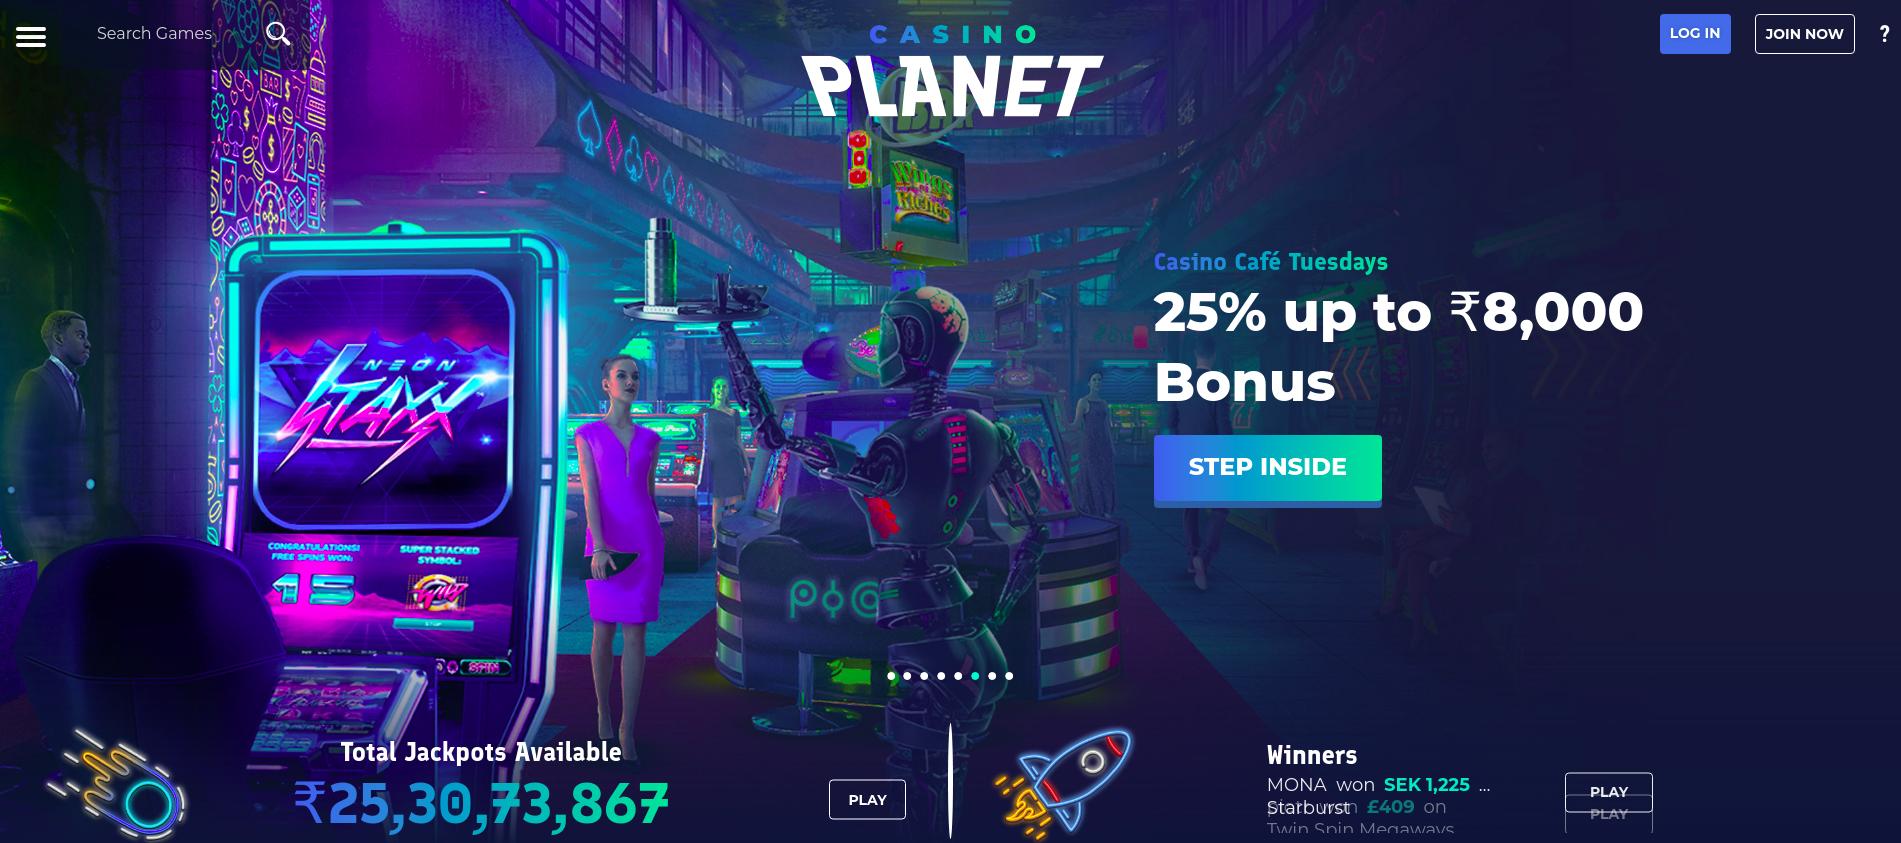 casino-planet-screenshot